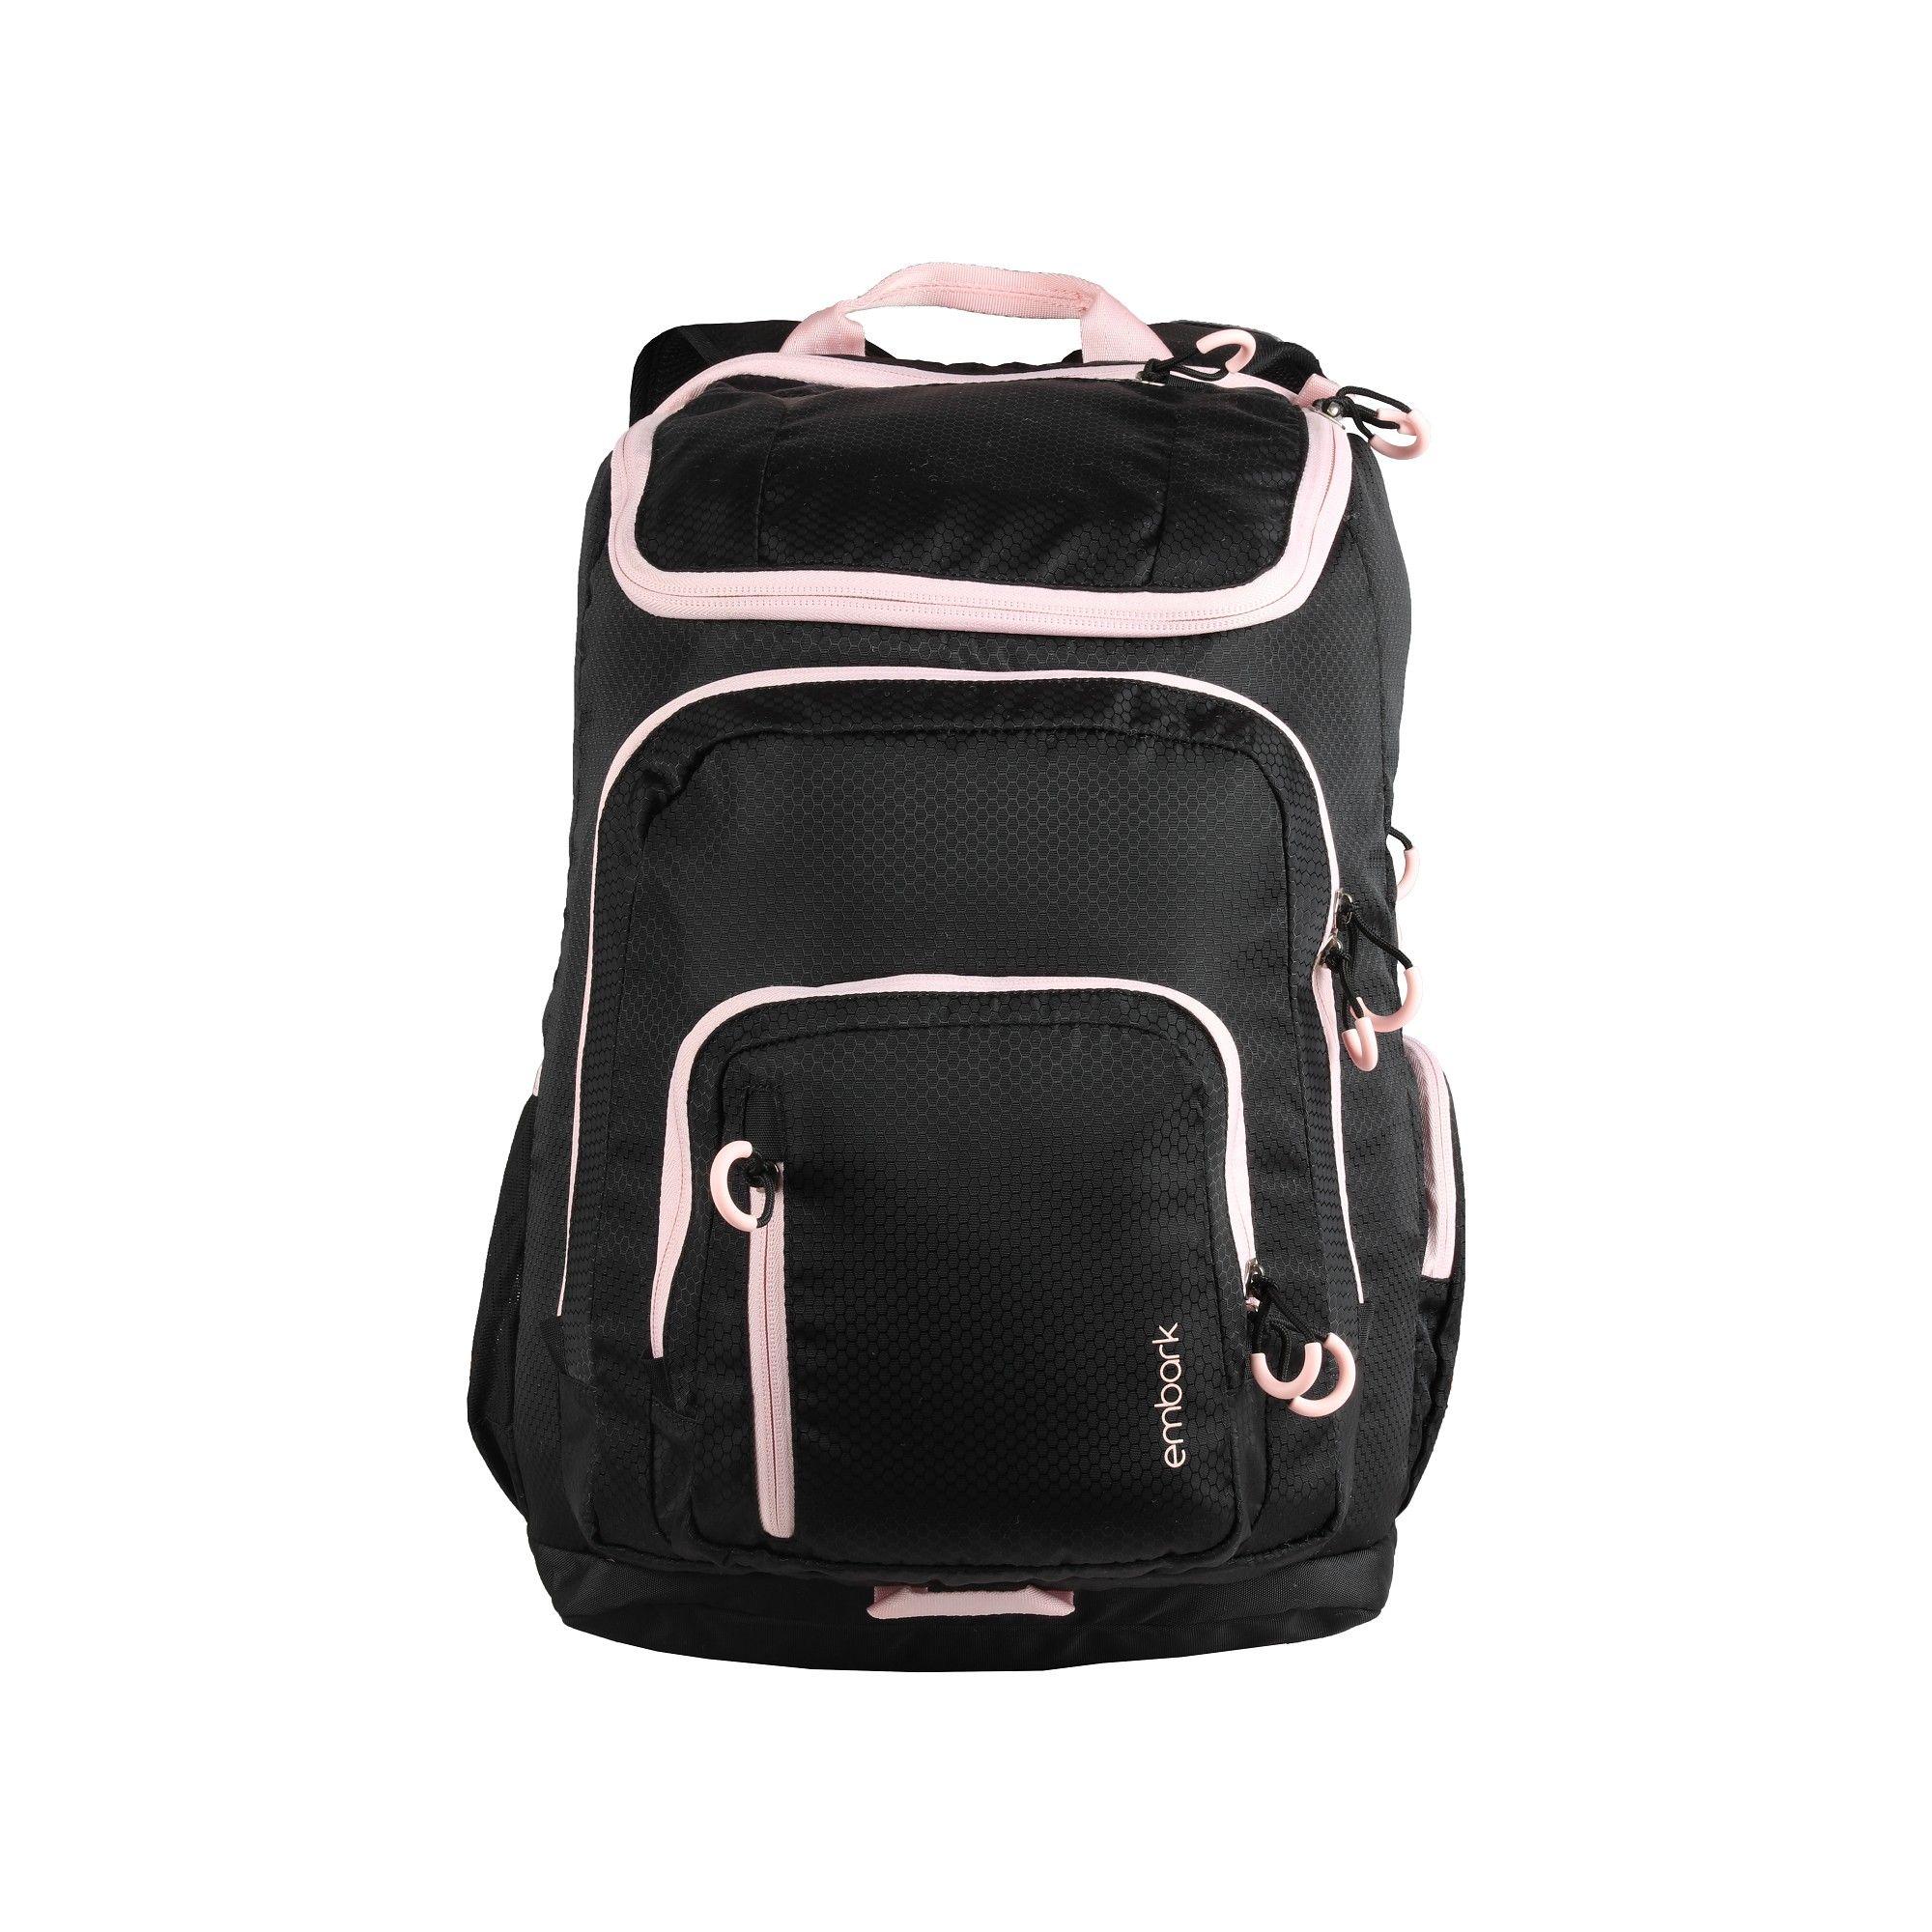 752a2472165e 19 Jartop Elite Backpack - Black/Light Pink - Embark   Products ...